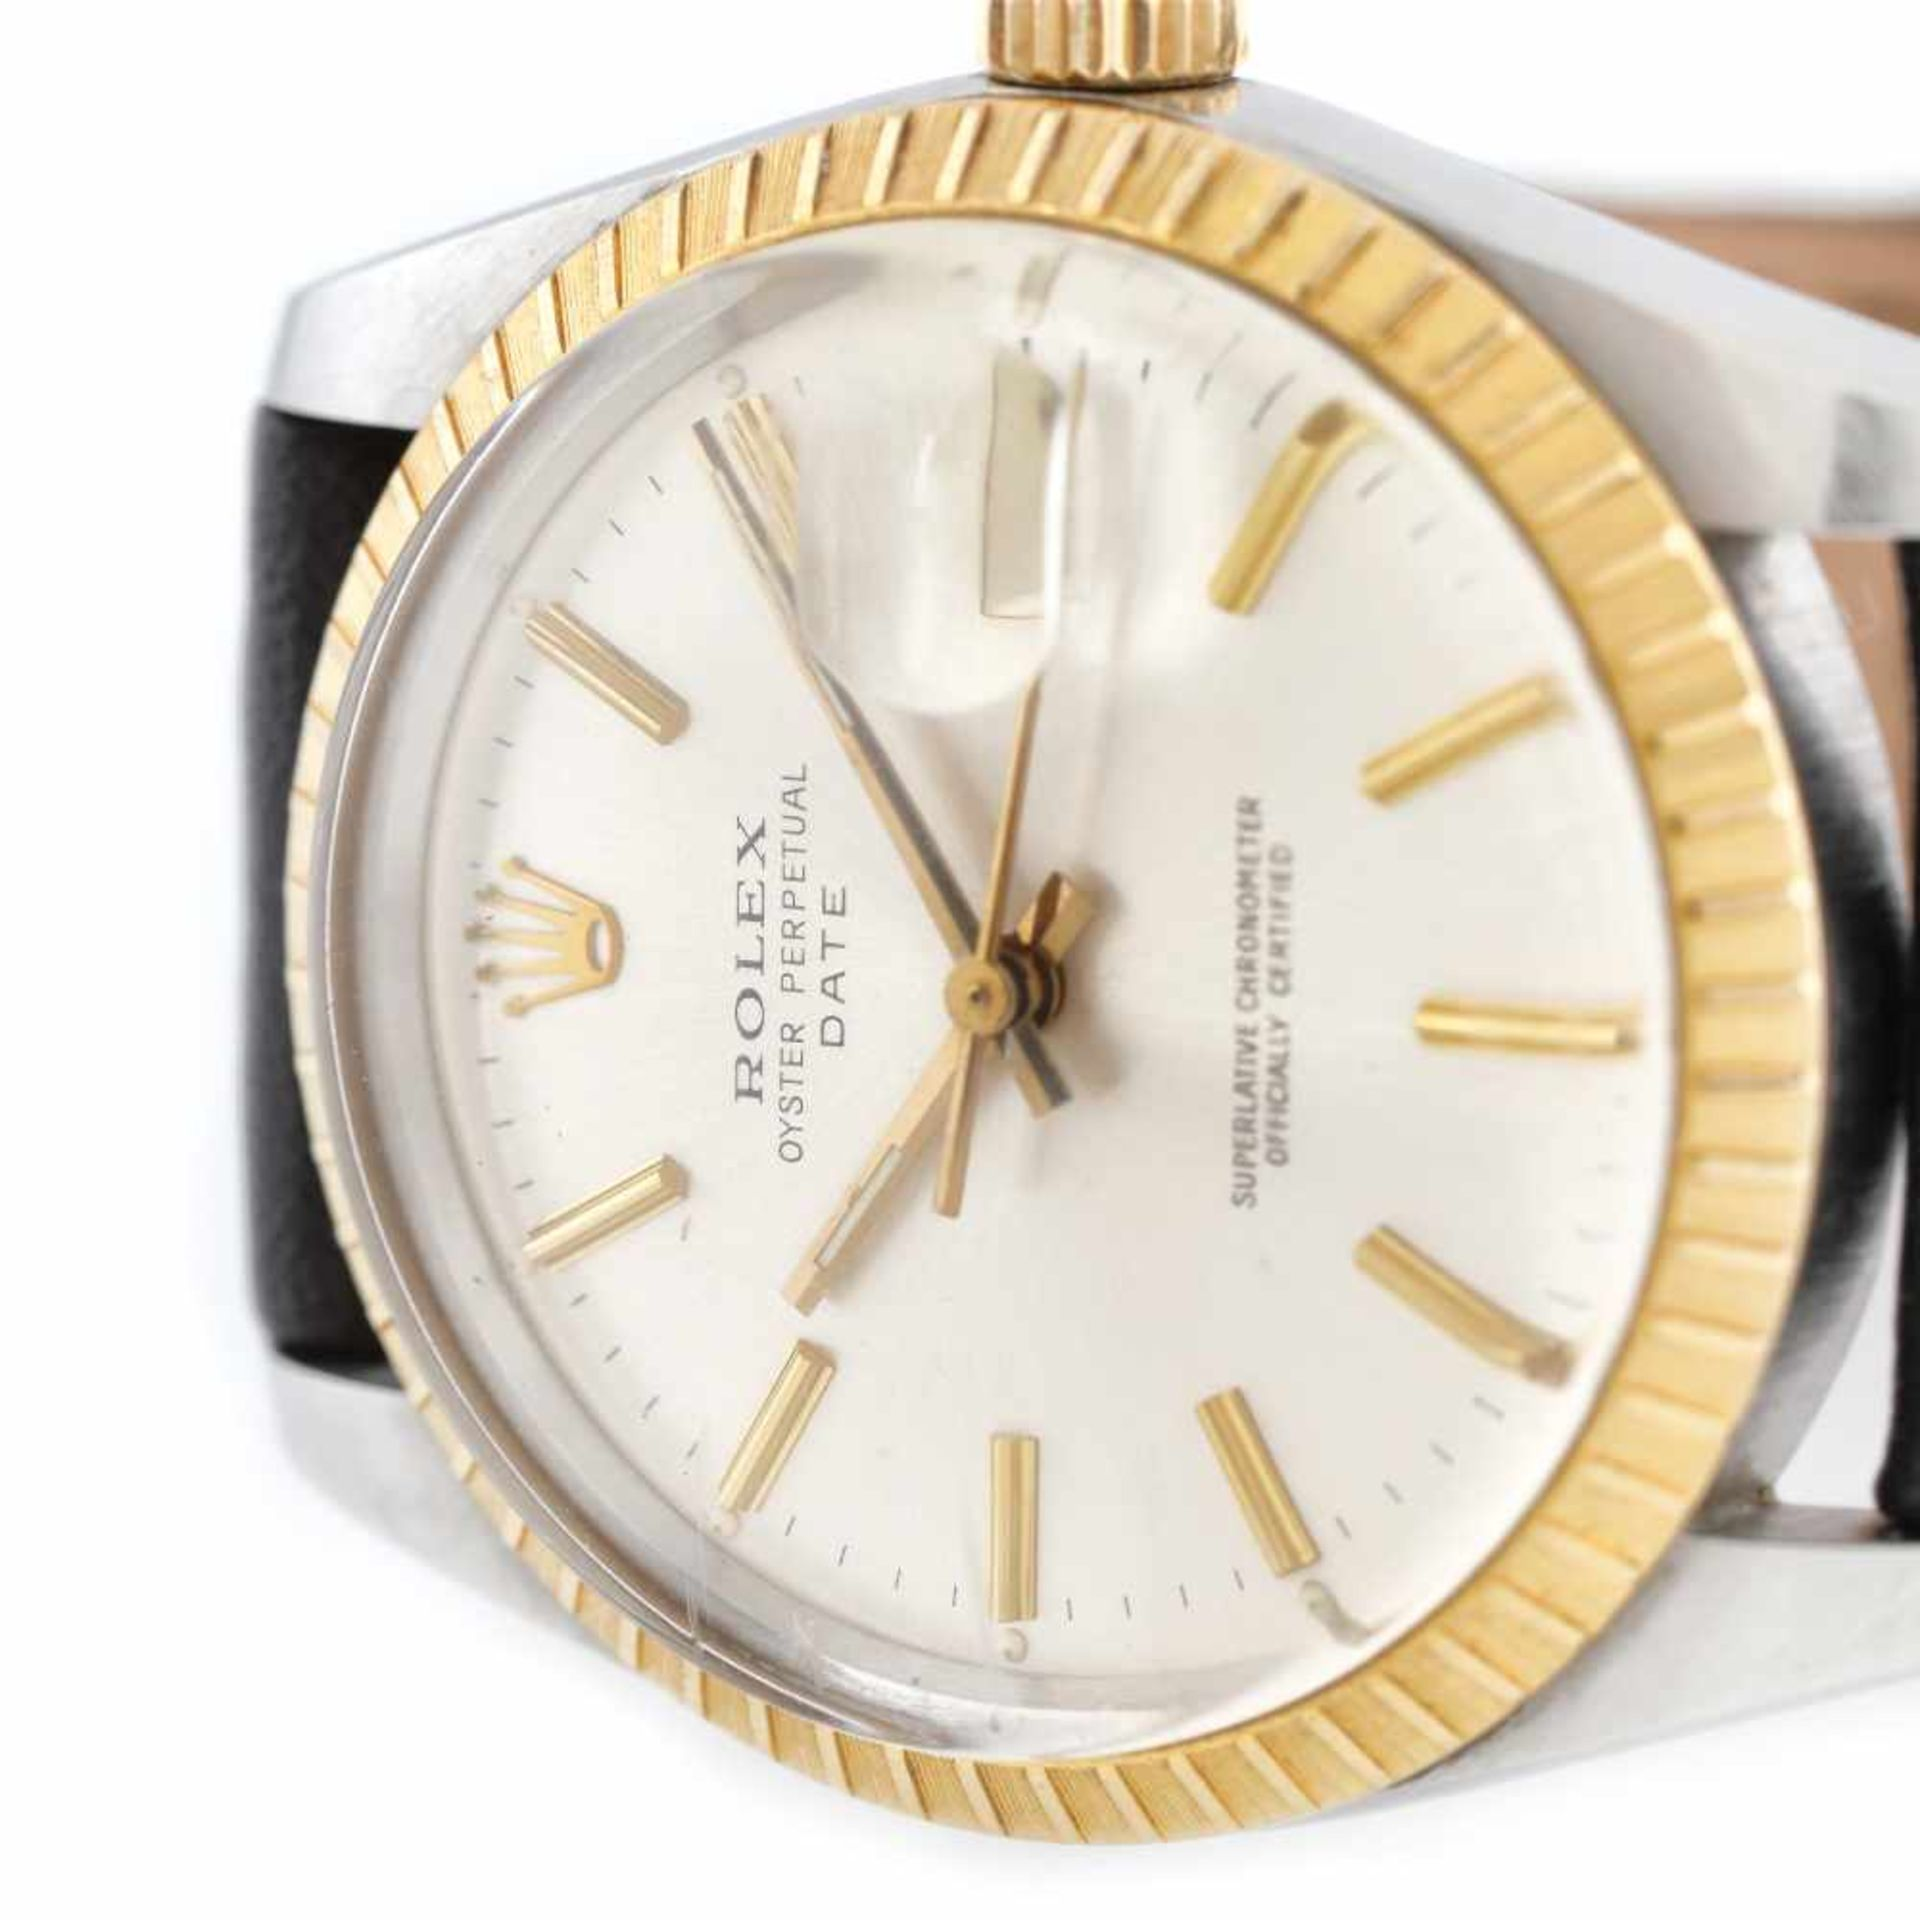 Rolex Oyster Perpetual Date wristwatch, gold and steel, men - Bild 3 aus 3